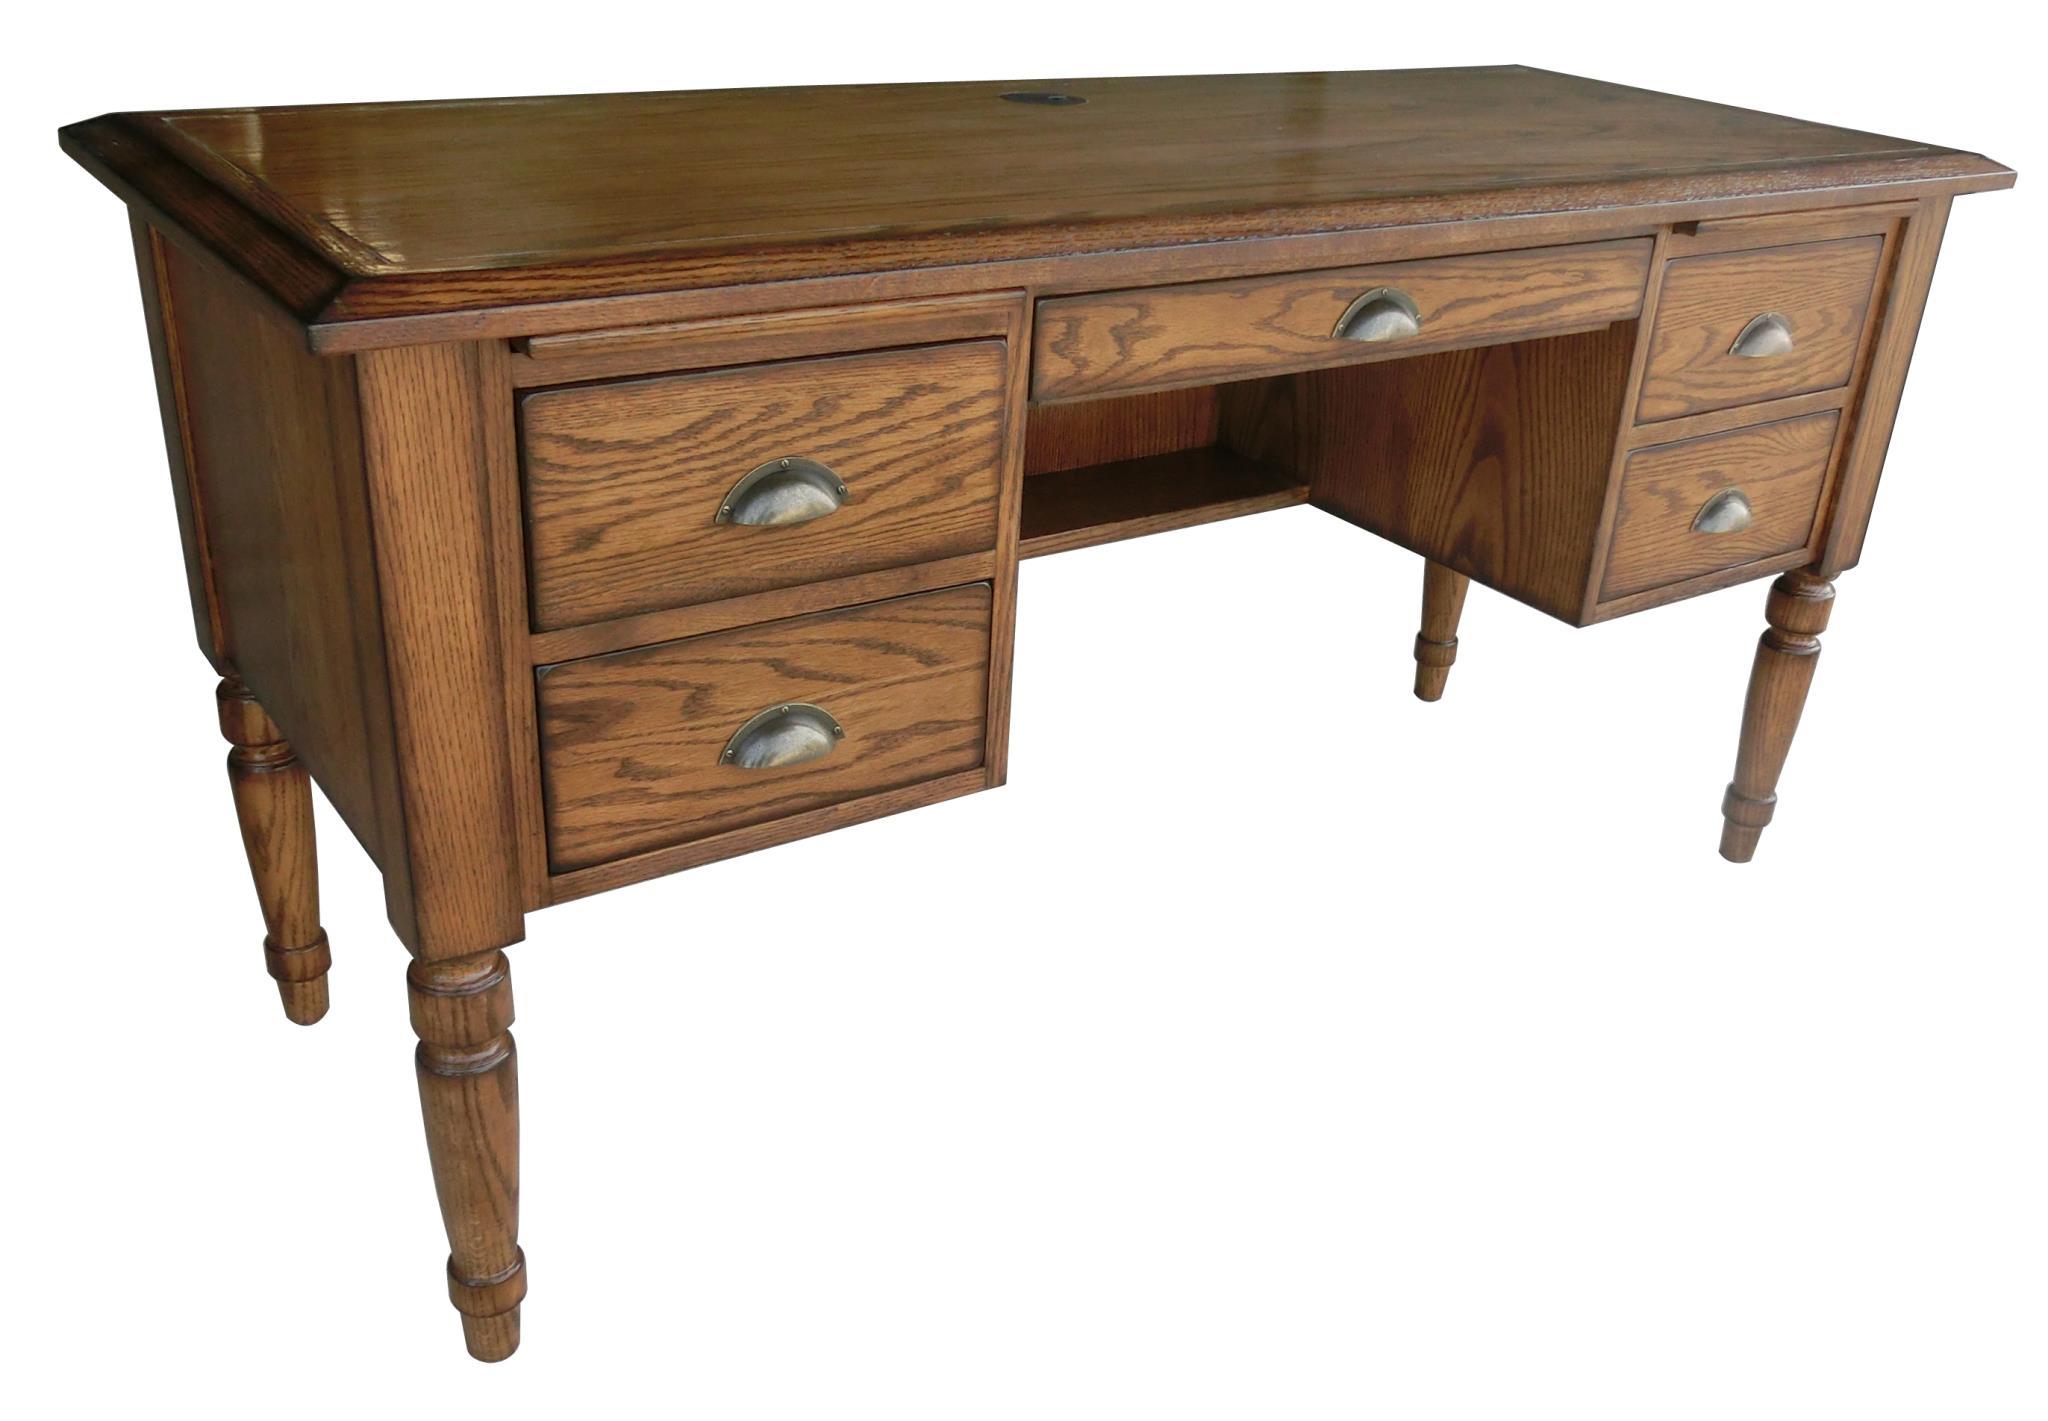 Oak furniture outlet knoxville tn furniture knoxville tn for Dining room tables knoxville tn